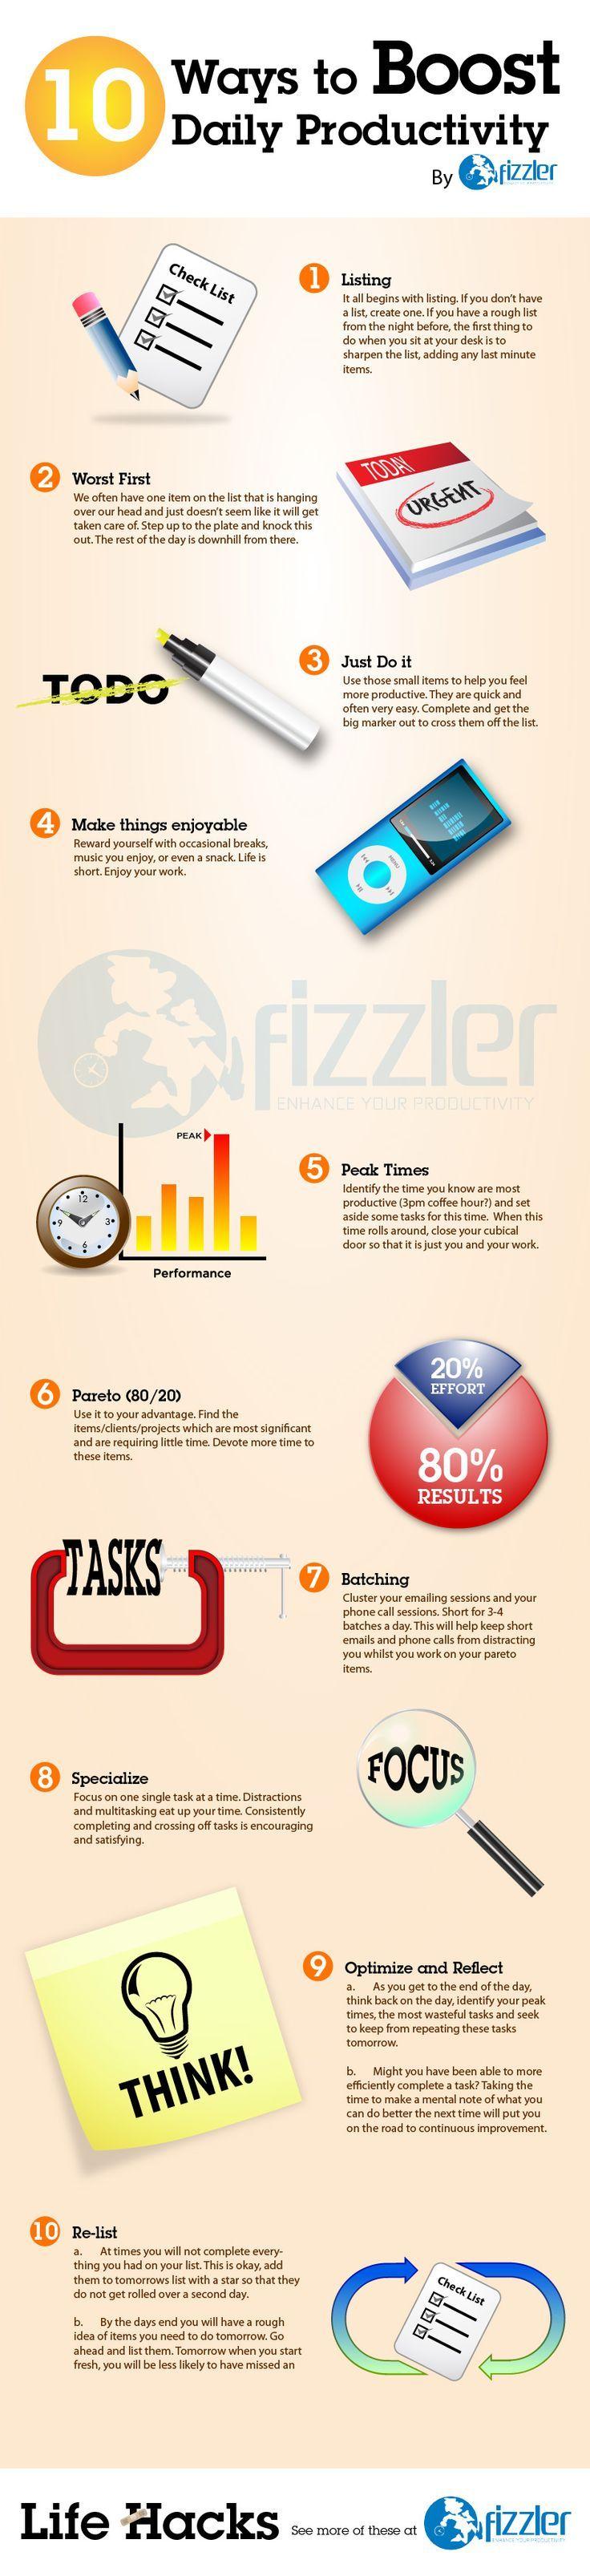 10 Ways to Boost Productivity - Lifehack #TimeManagement #CareerGoals #PersonalResponsibility